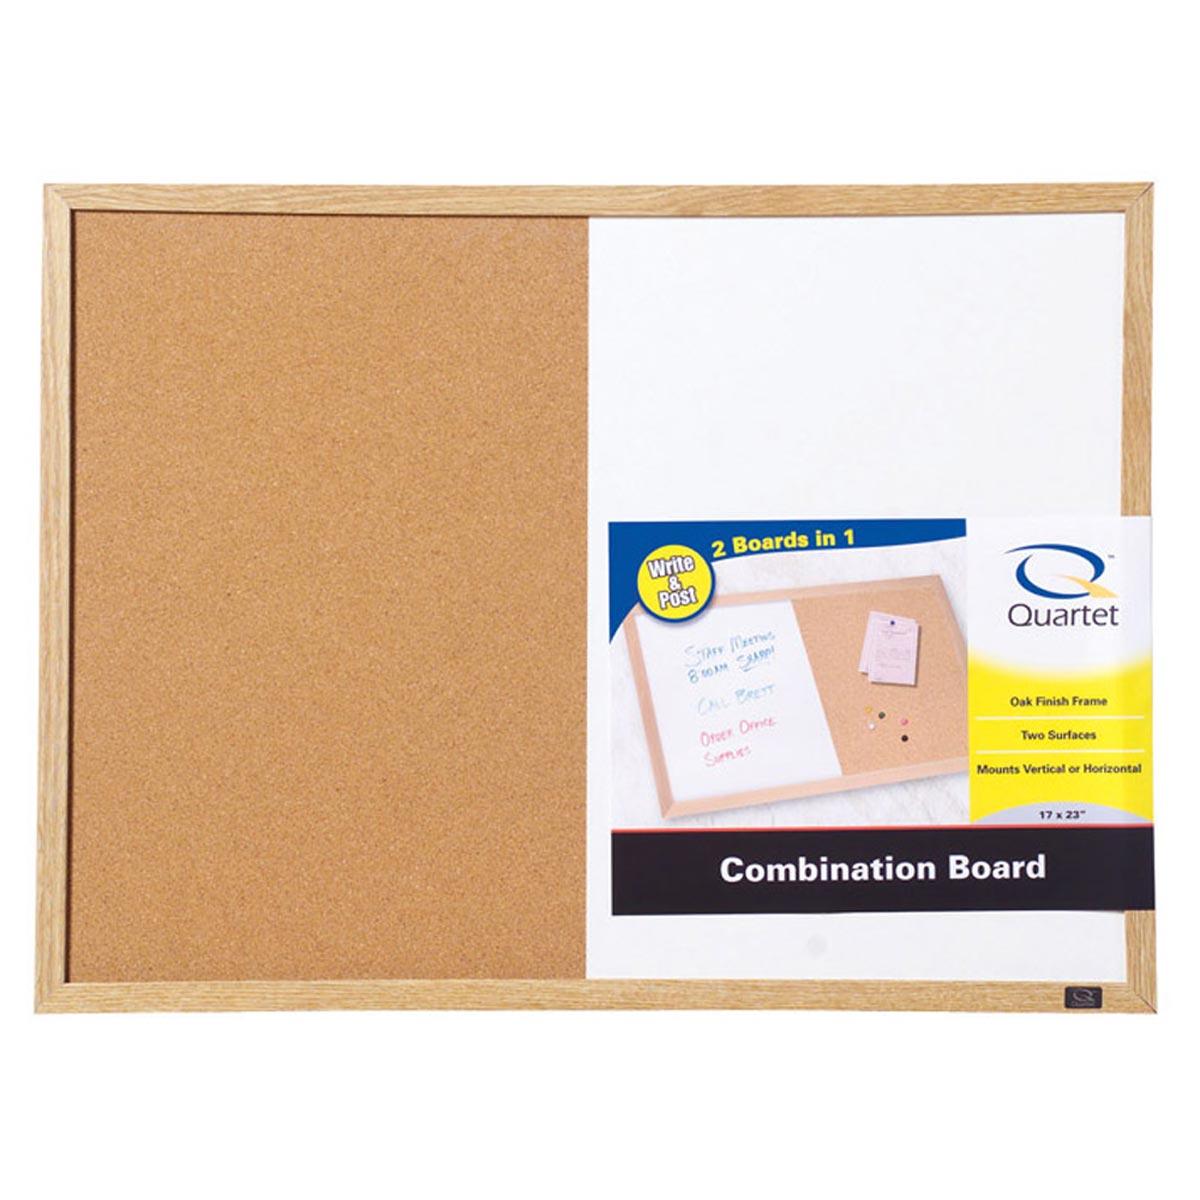 Quartet 17 in. x 23 in. Screw-Mounted Combo 2-in-1 Cork Bulletin & Dry Erase Board